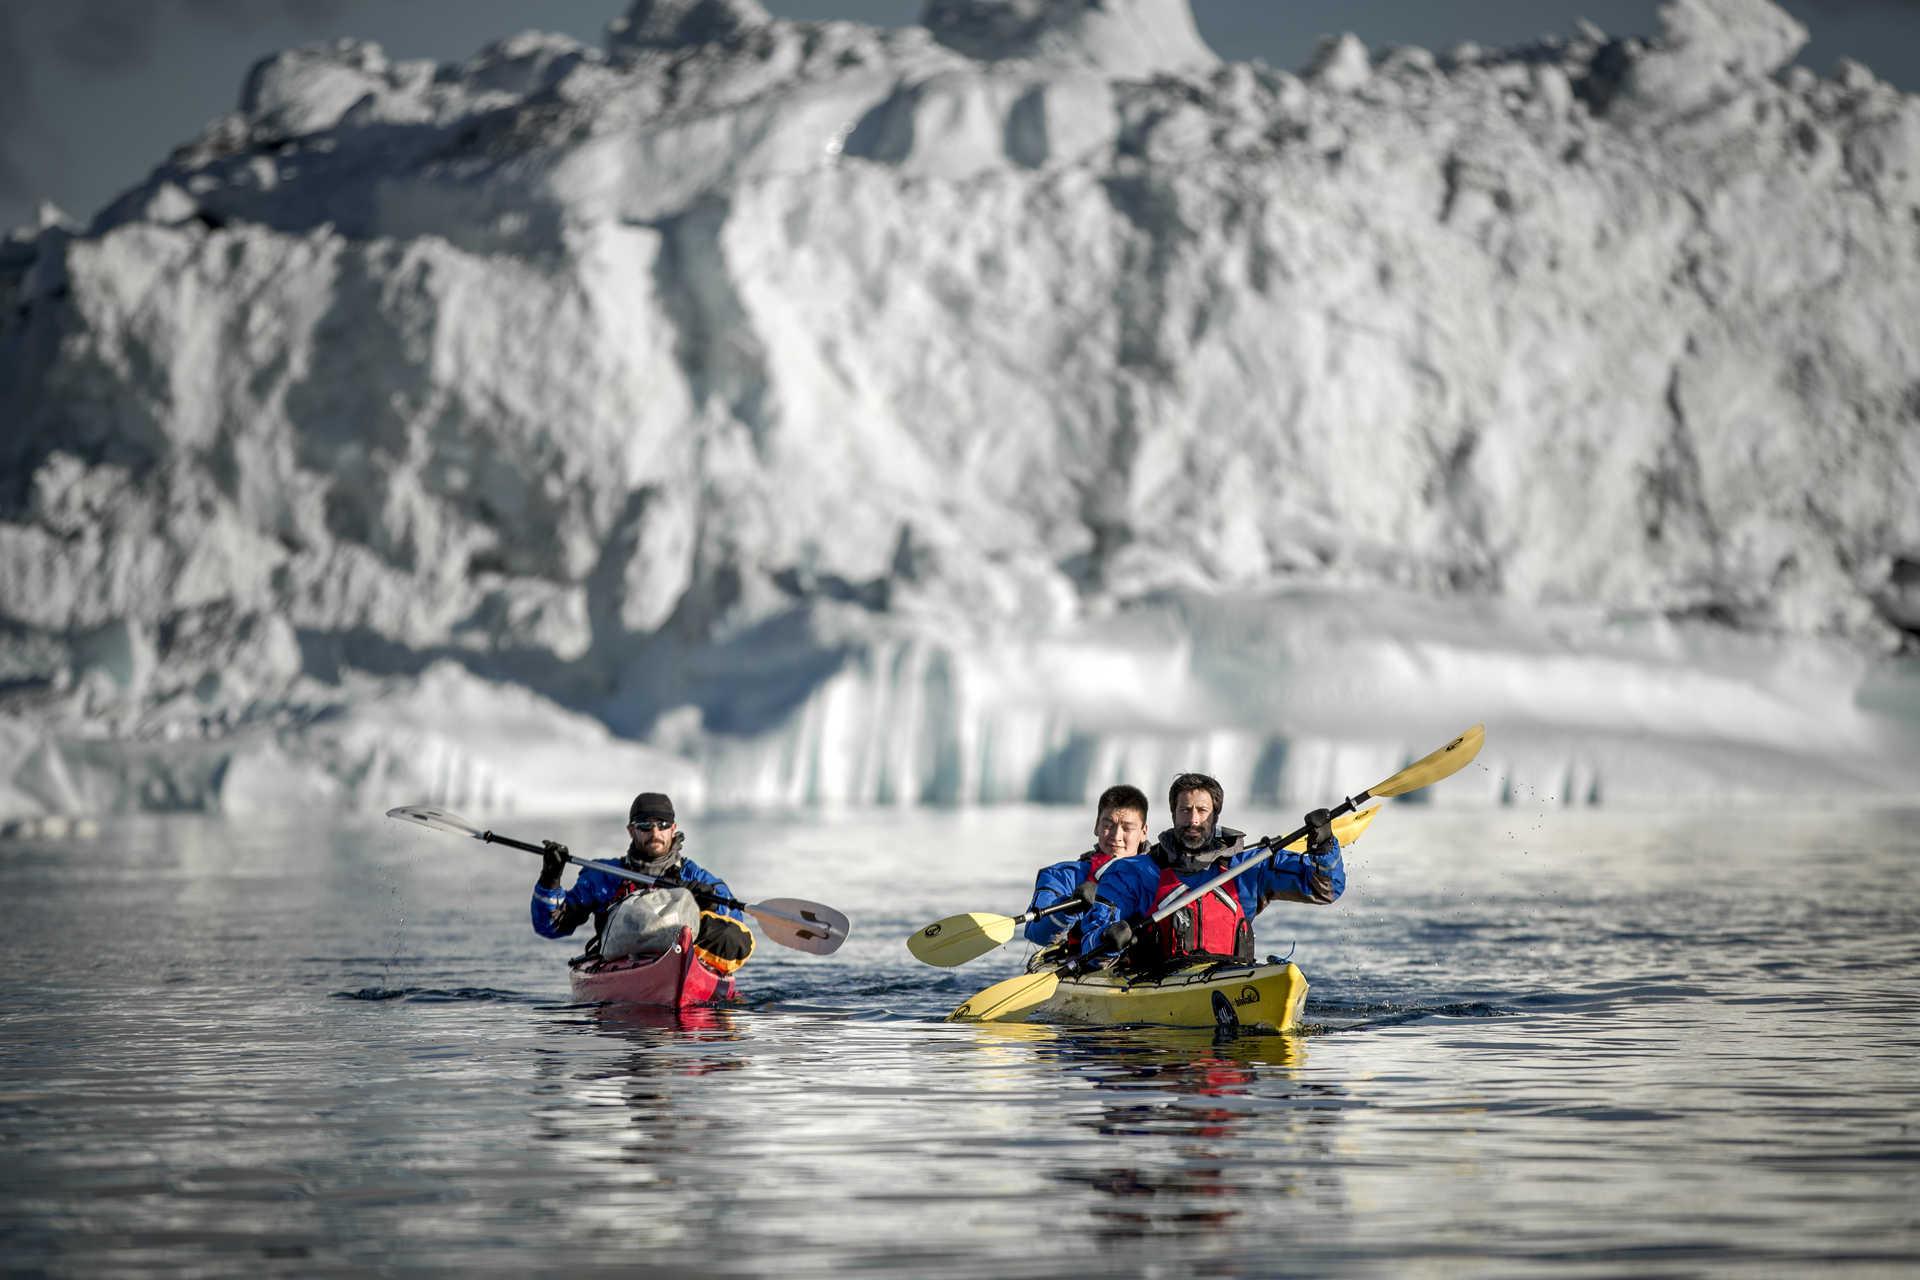 Kayakistes en Arctique